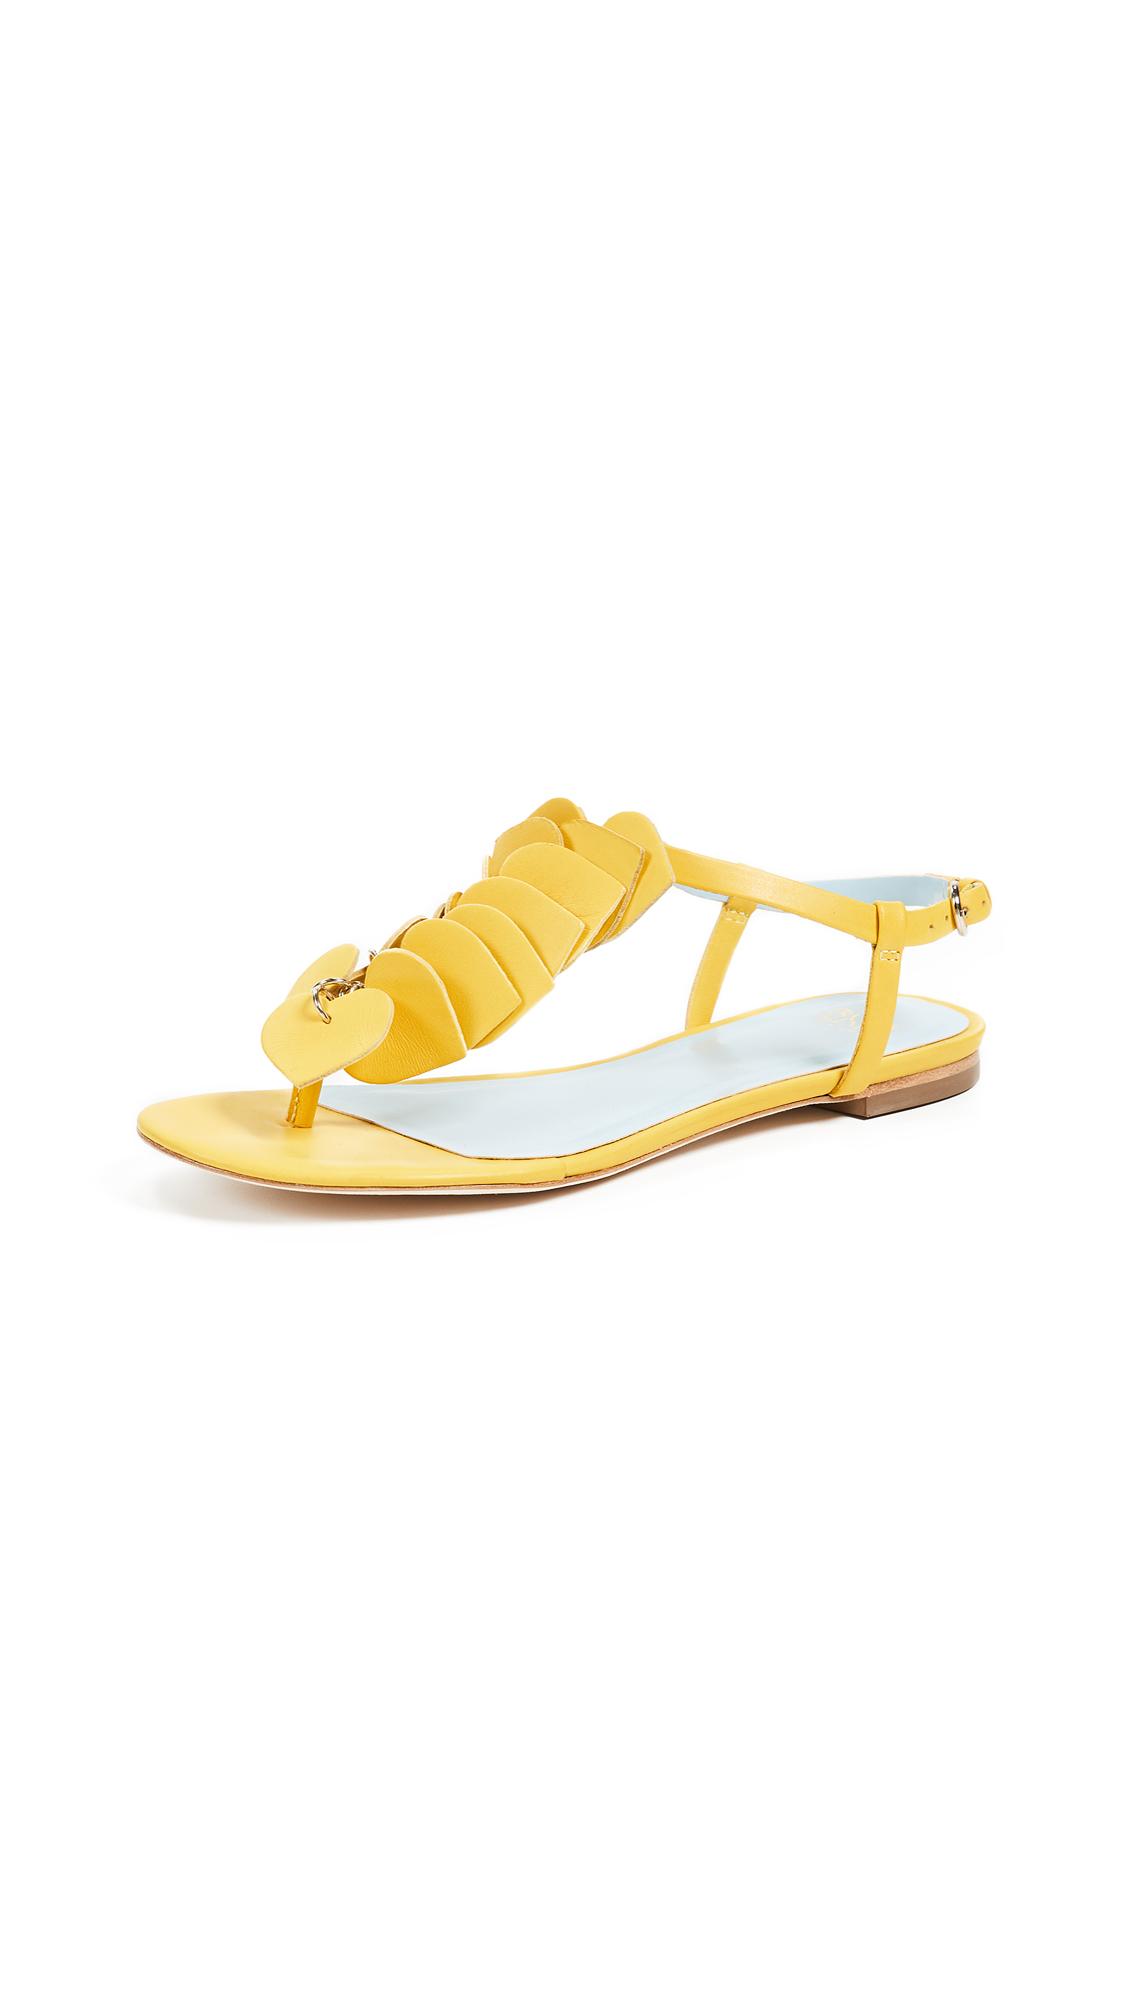 Frances Valentine Allison Sandals - Yellow